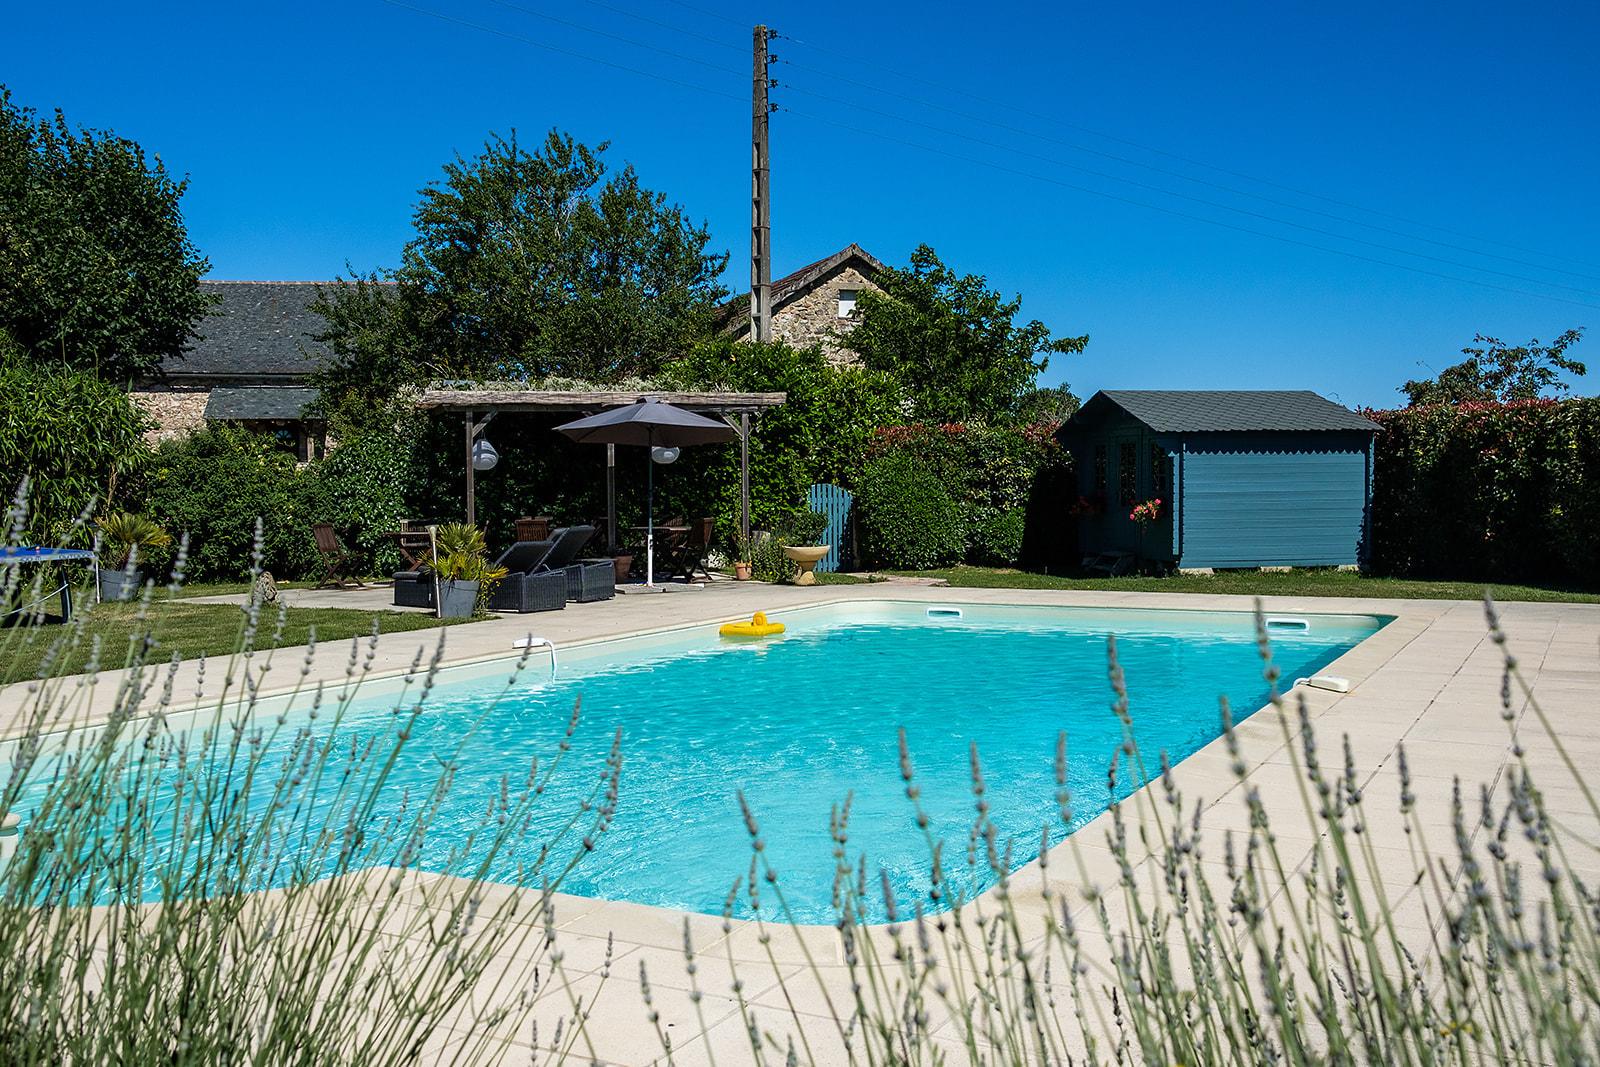 Piscine Le Muret-Camping Le Muret